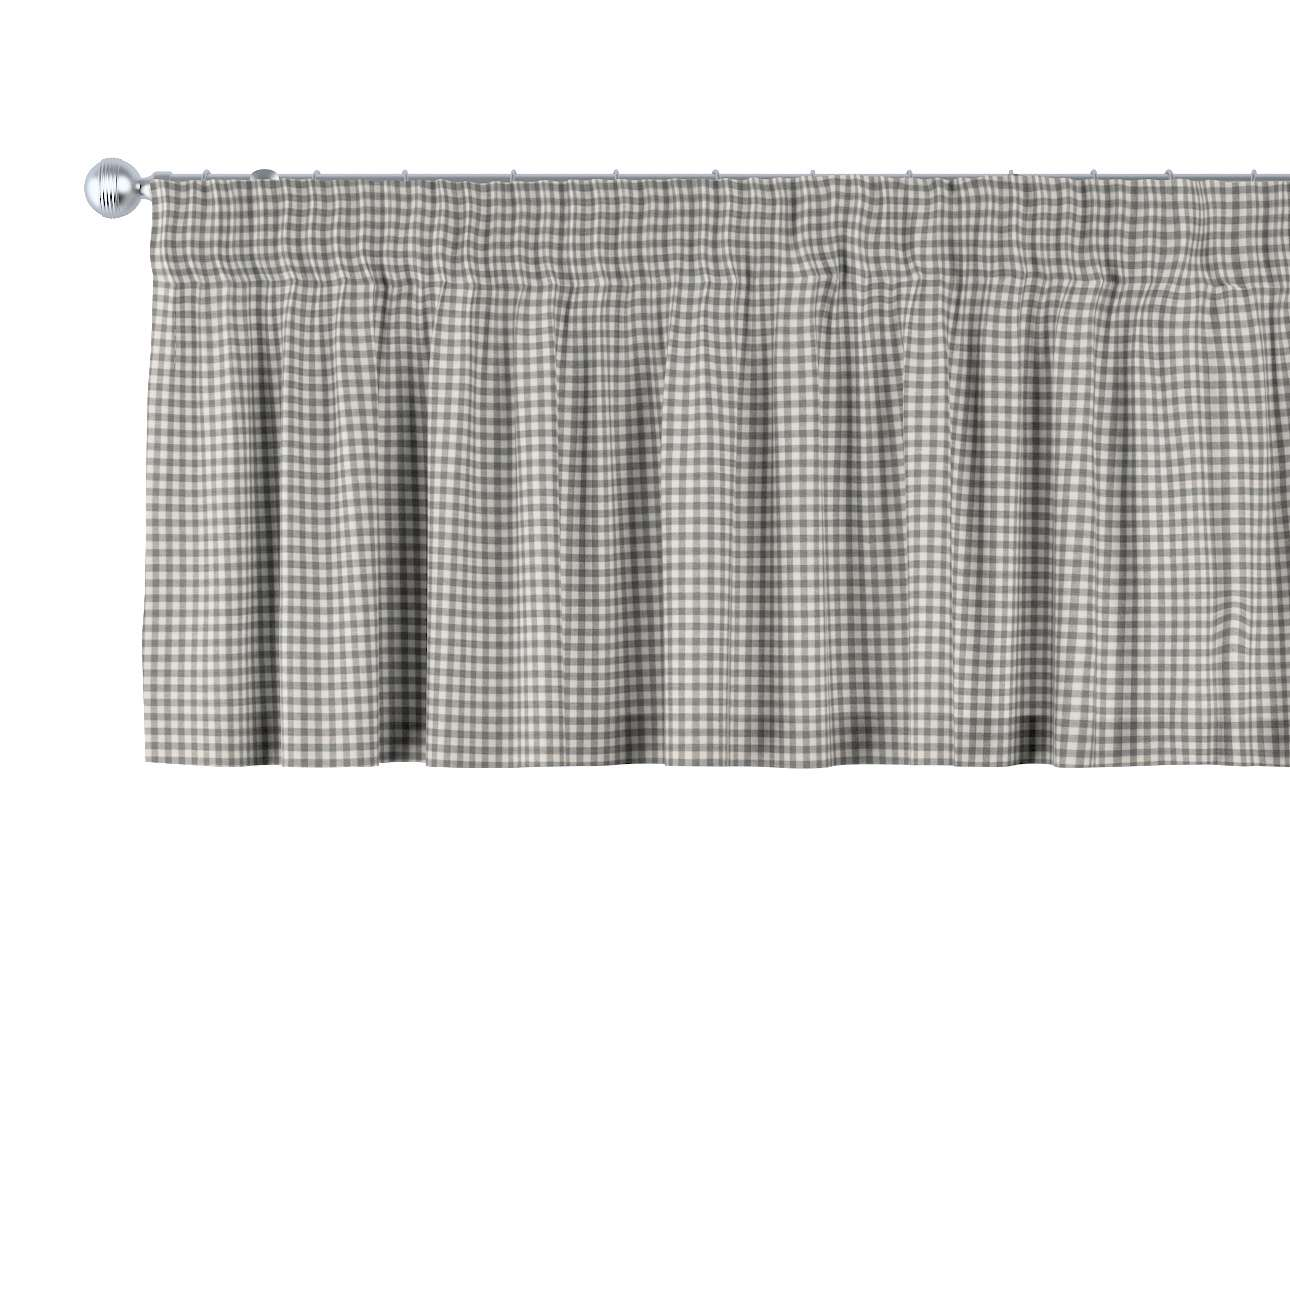 Quadro 136-10 V kolekcii Quadro, tkanina: 136-10